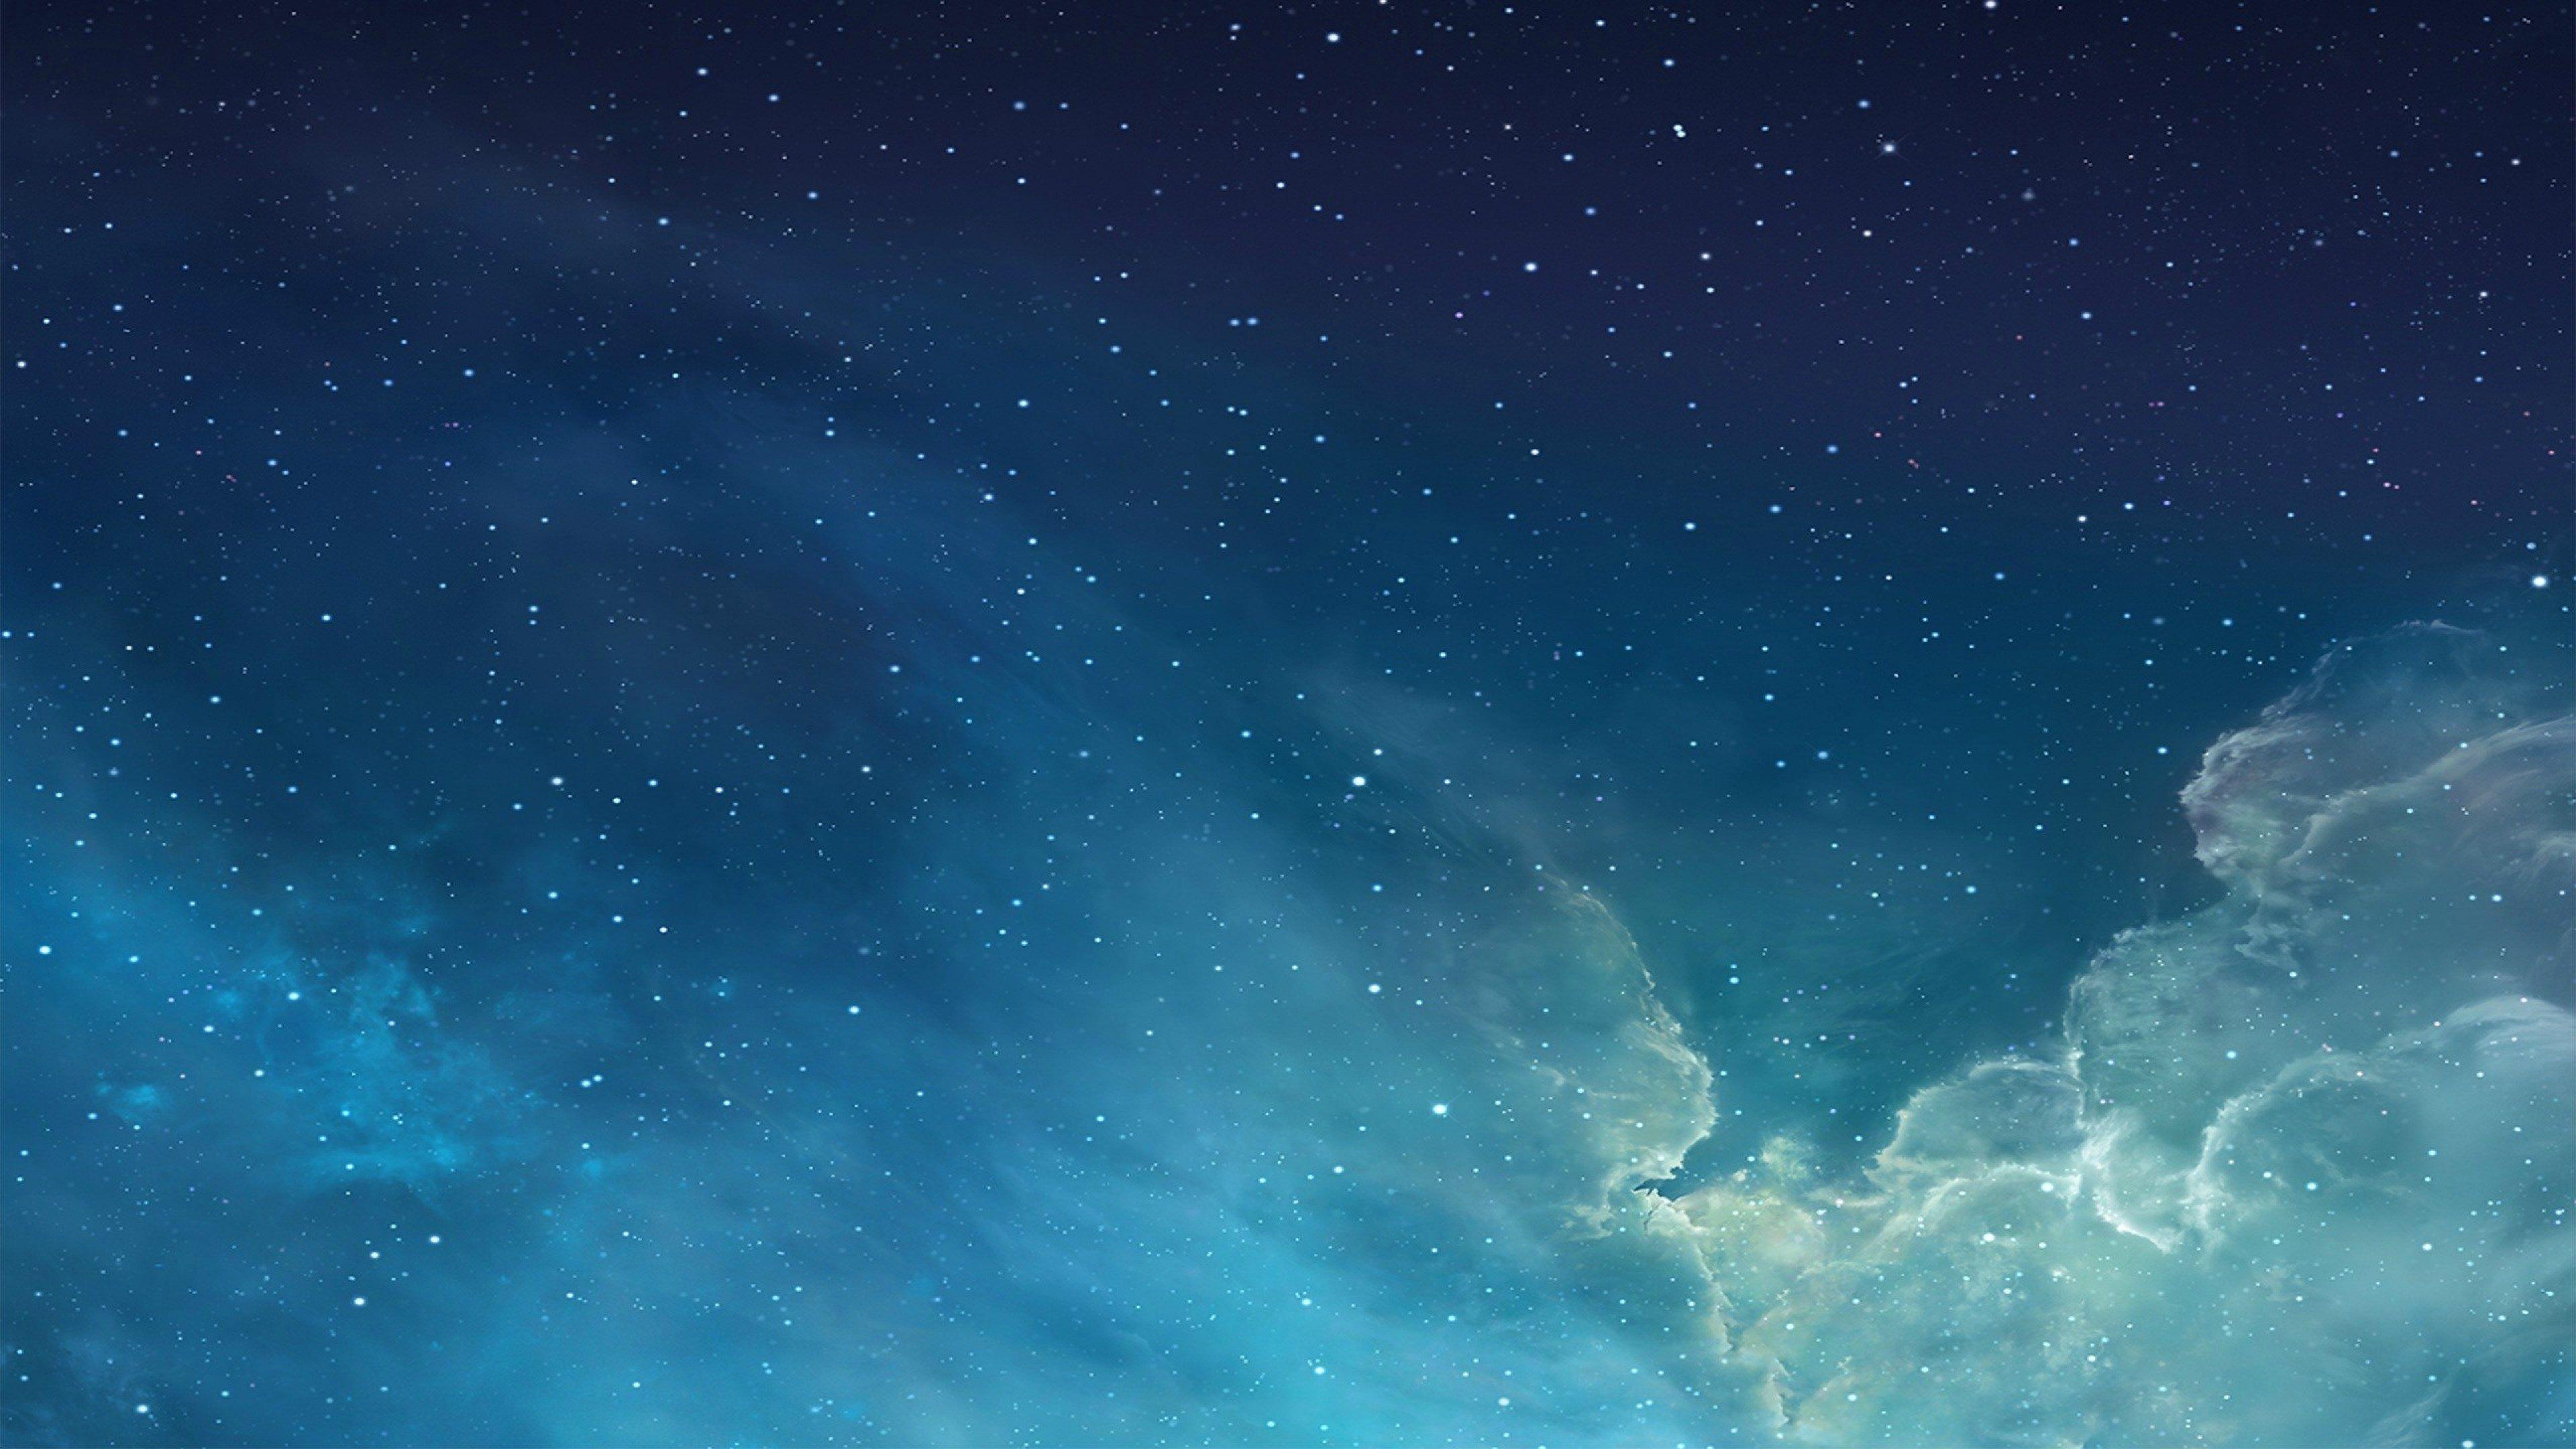 Desktop Backgrounds Aesthetic Wallpaper 4k